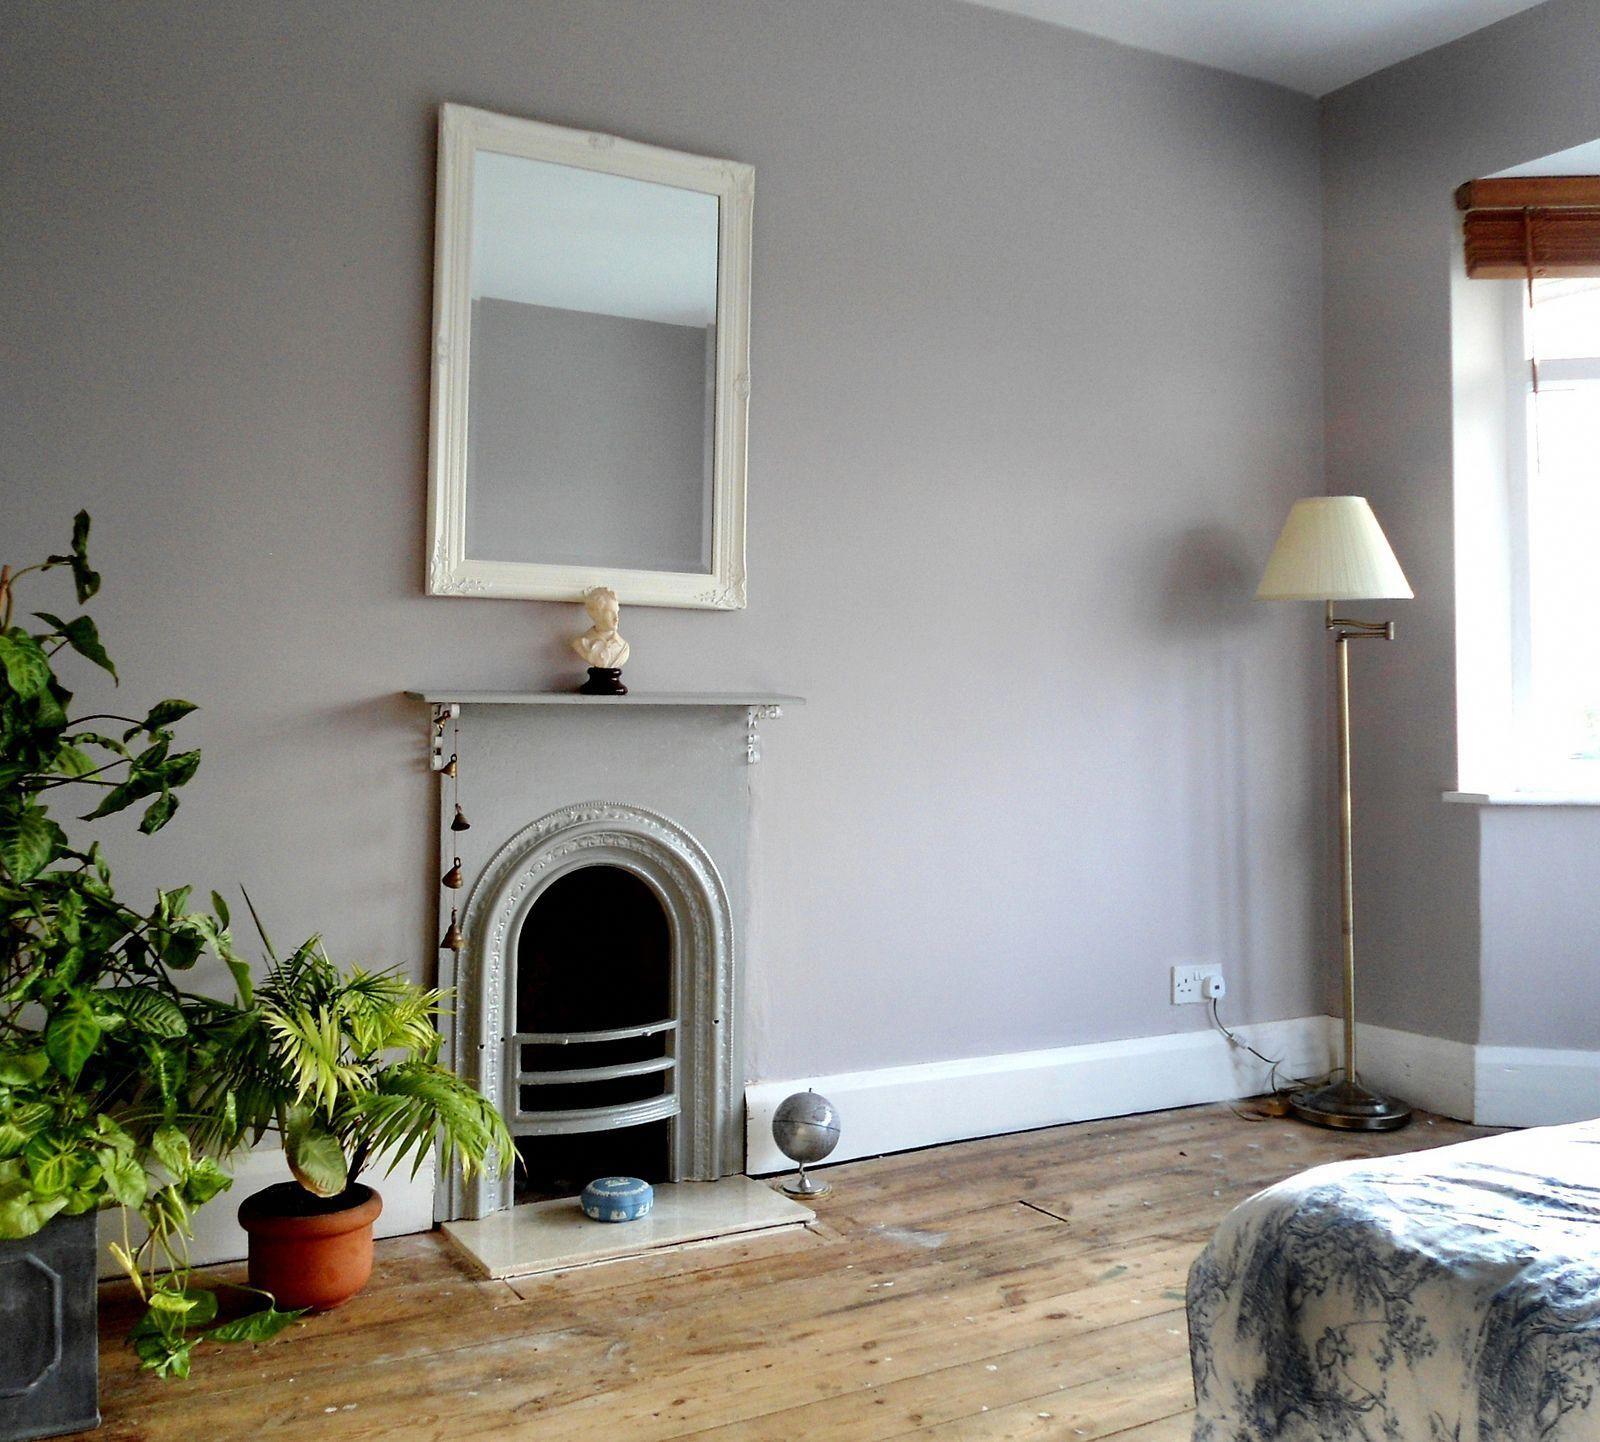 Chalk Blush Dulux Paint Flickr Photo Sharing Hallwayideas Grey Paint Living Room Living Room Paint Hallway Colours Bedroom paint ideas dulux